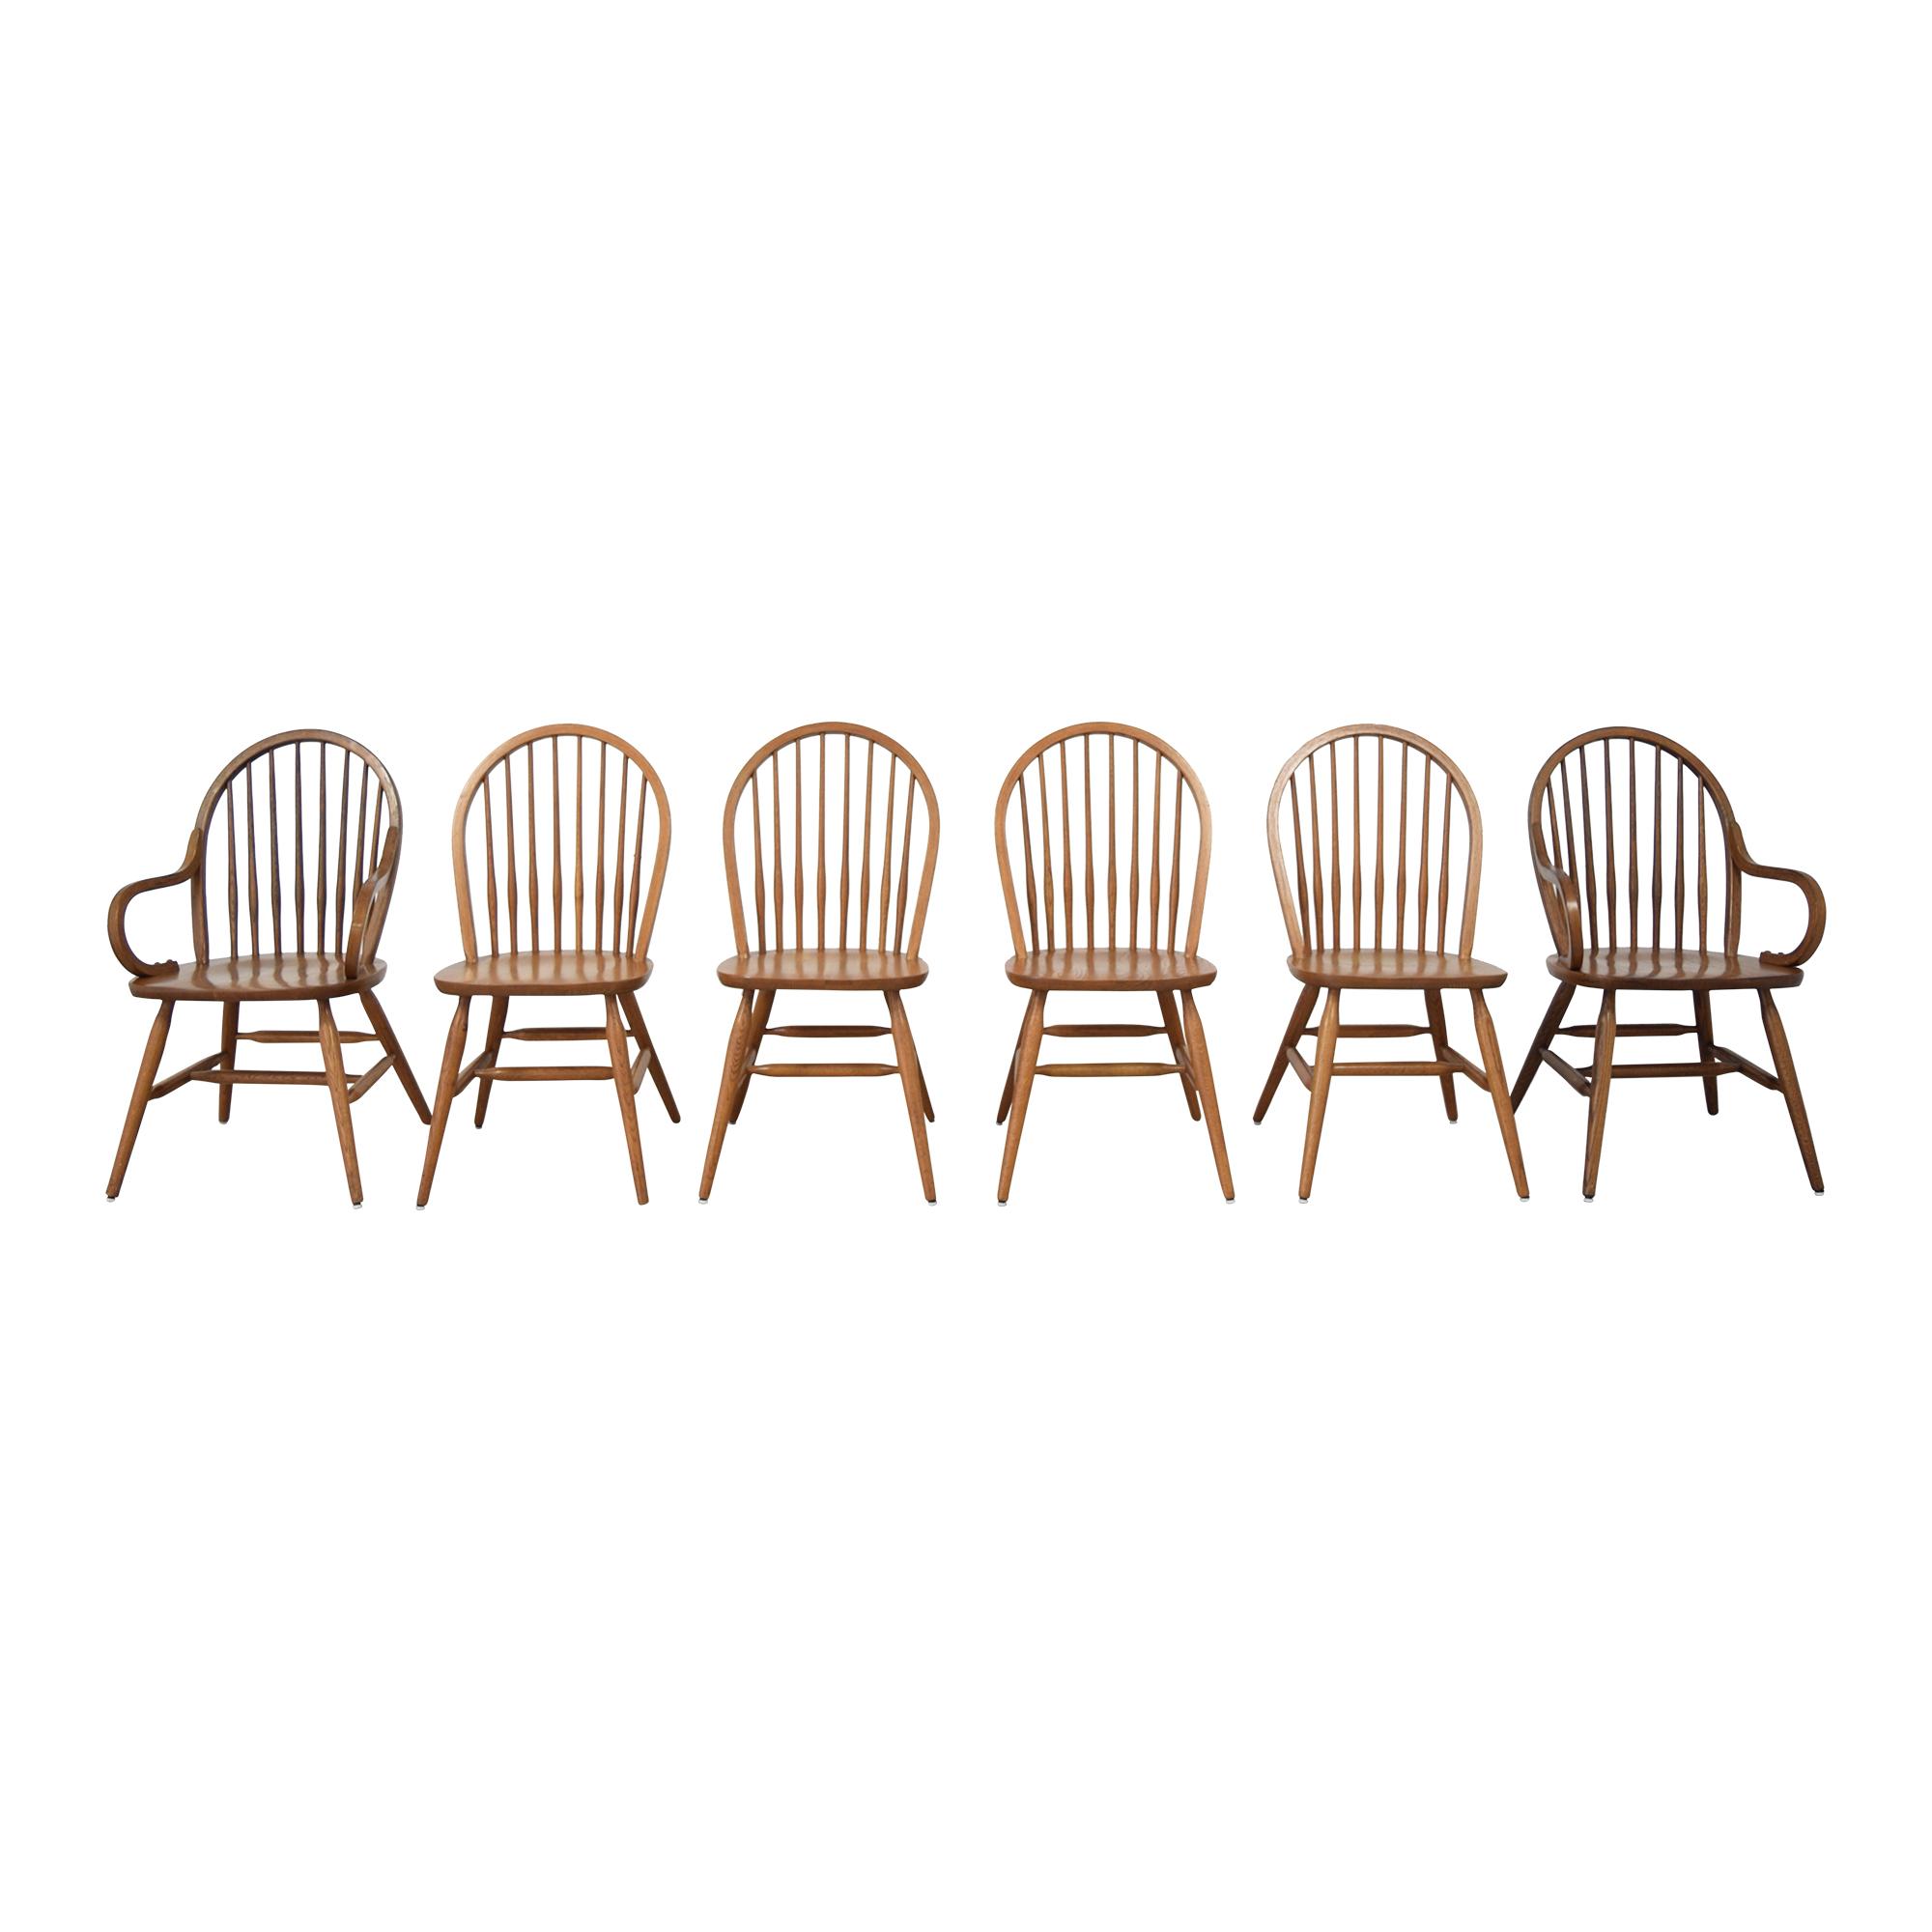 Keller Keller Windsor Dining Chairs pa